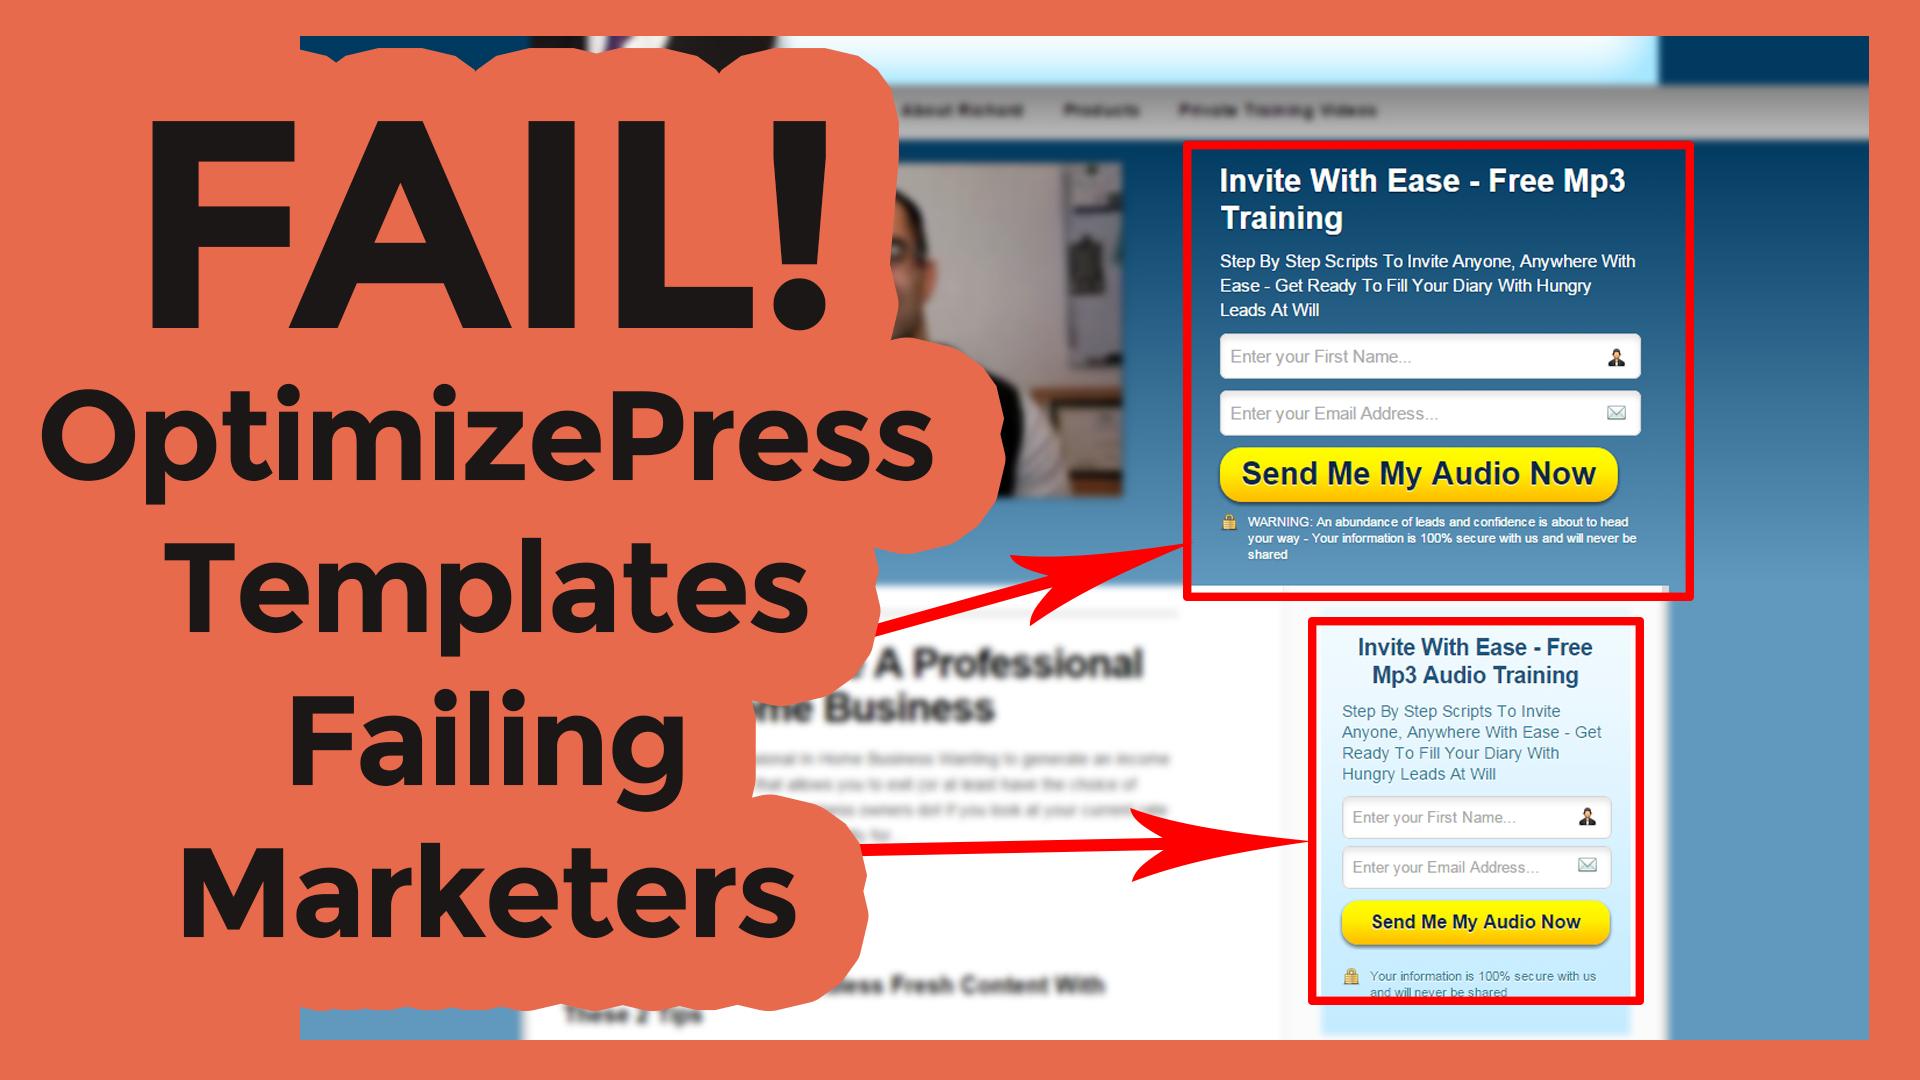 Optimizepress Templates Failing Marketers